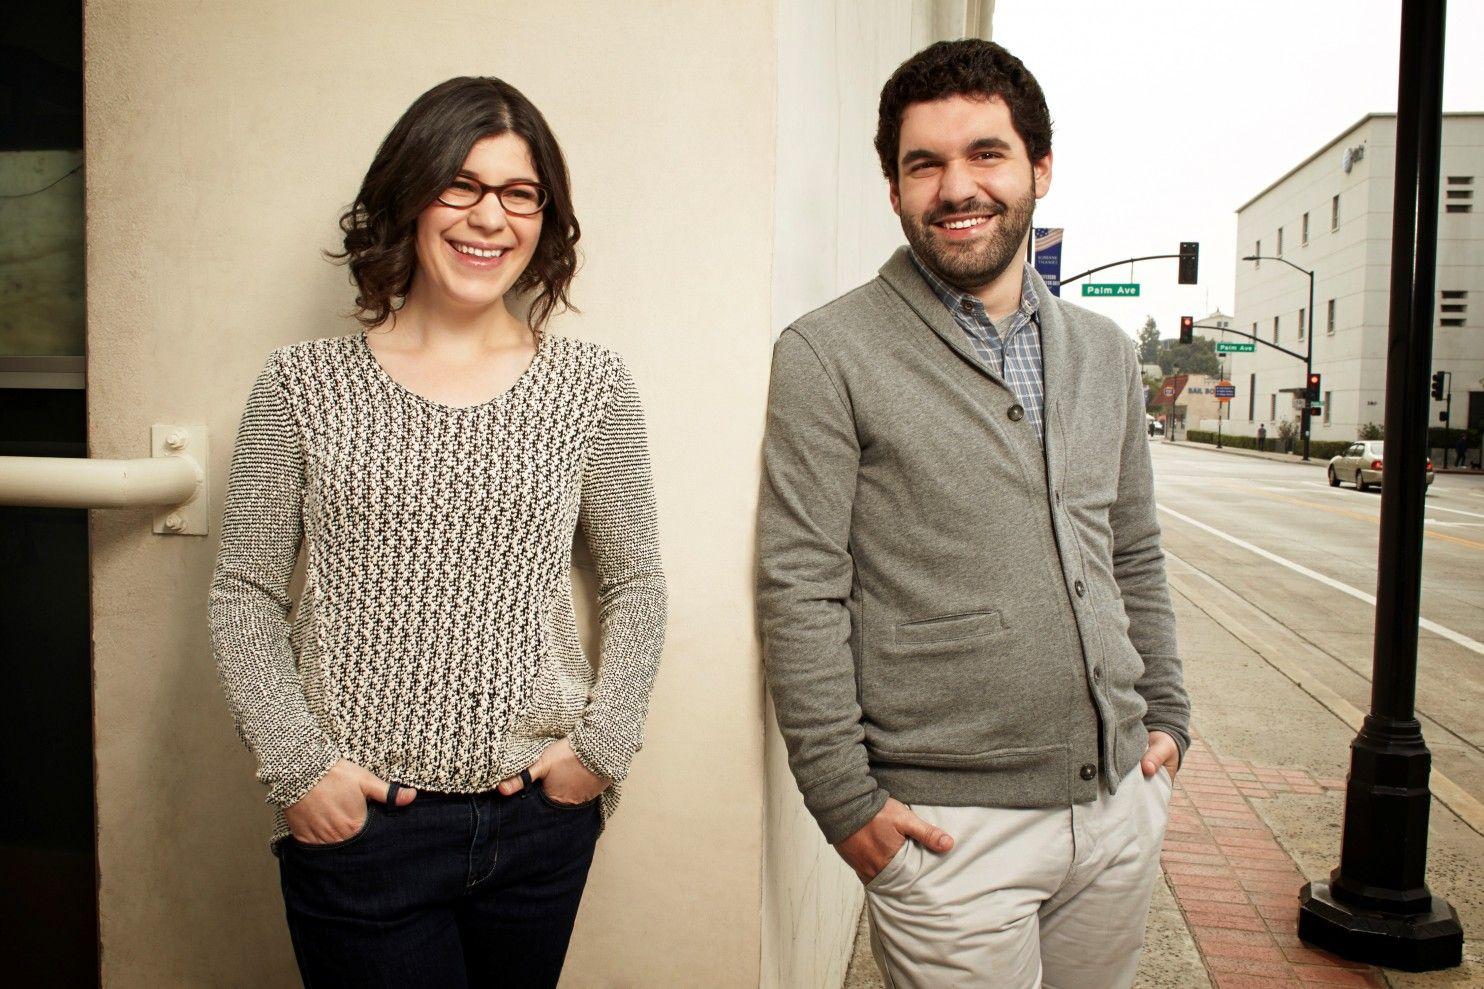 'Steven Universe' creator Rebecca Sugar is a Cartoon Network trailblazer - The Washington Post